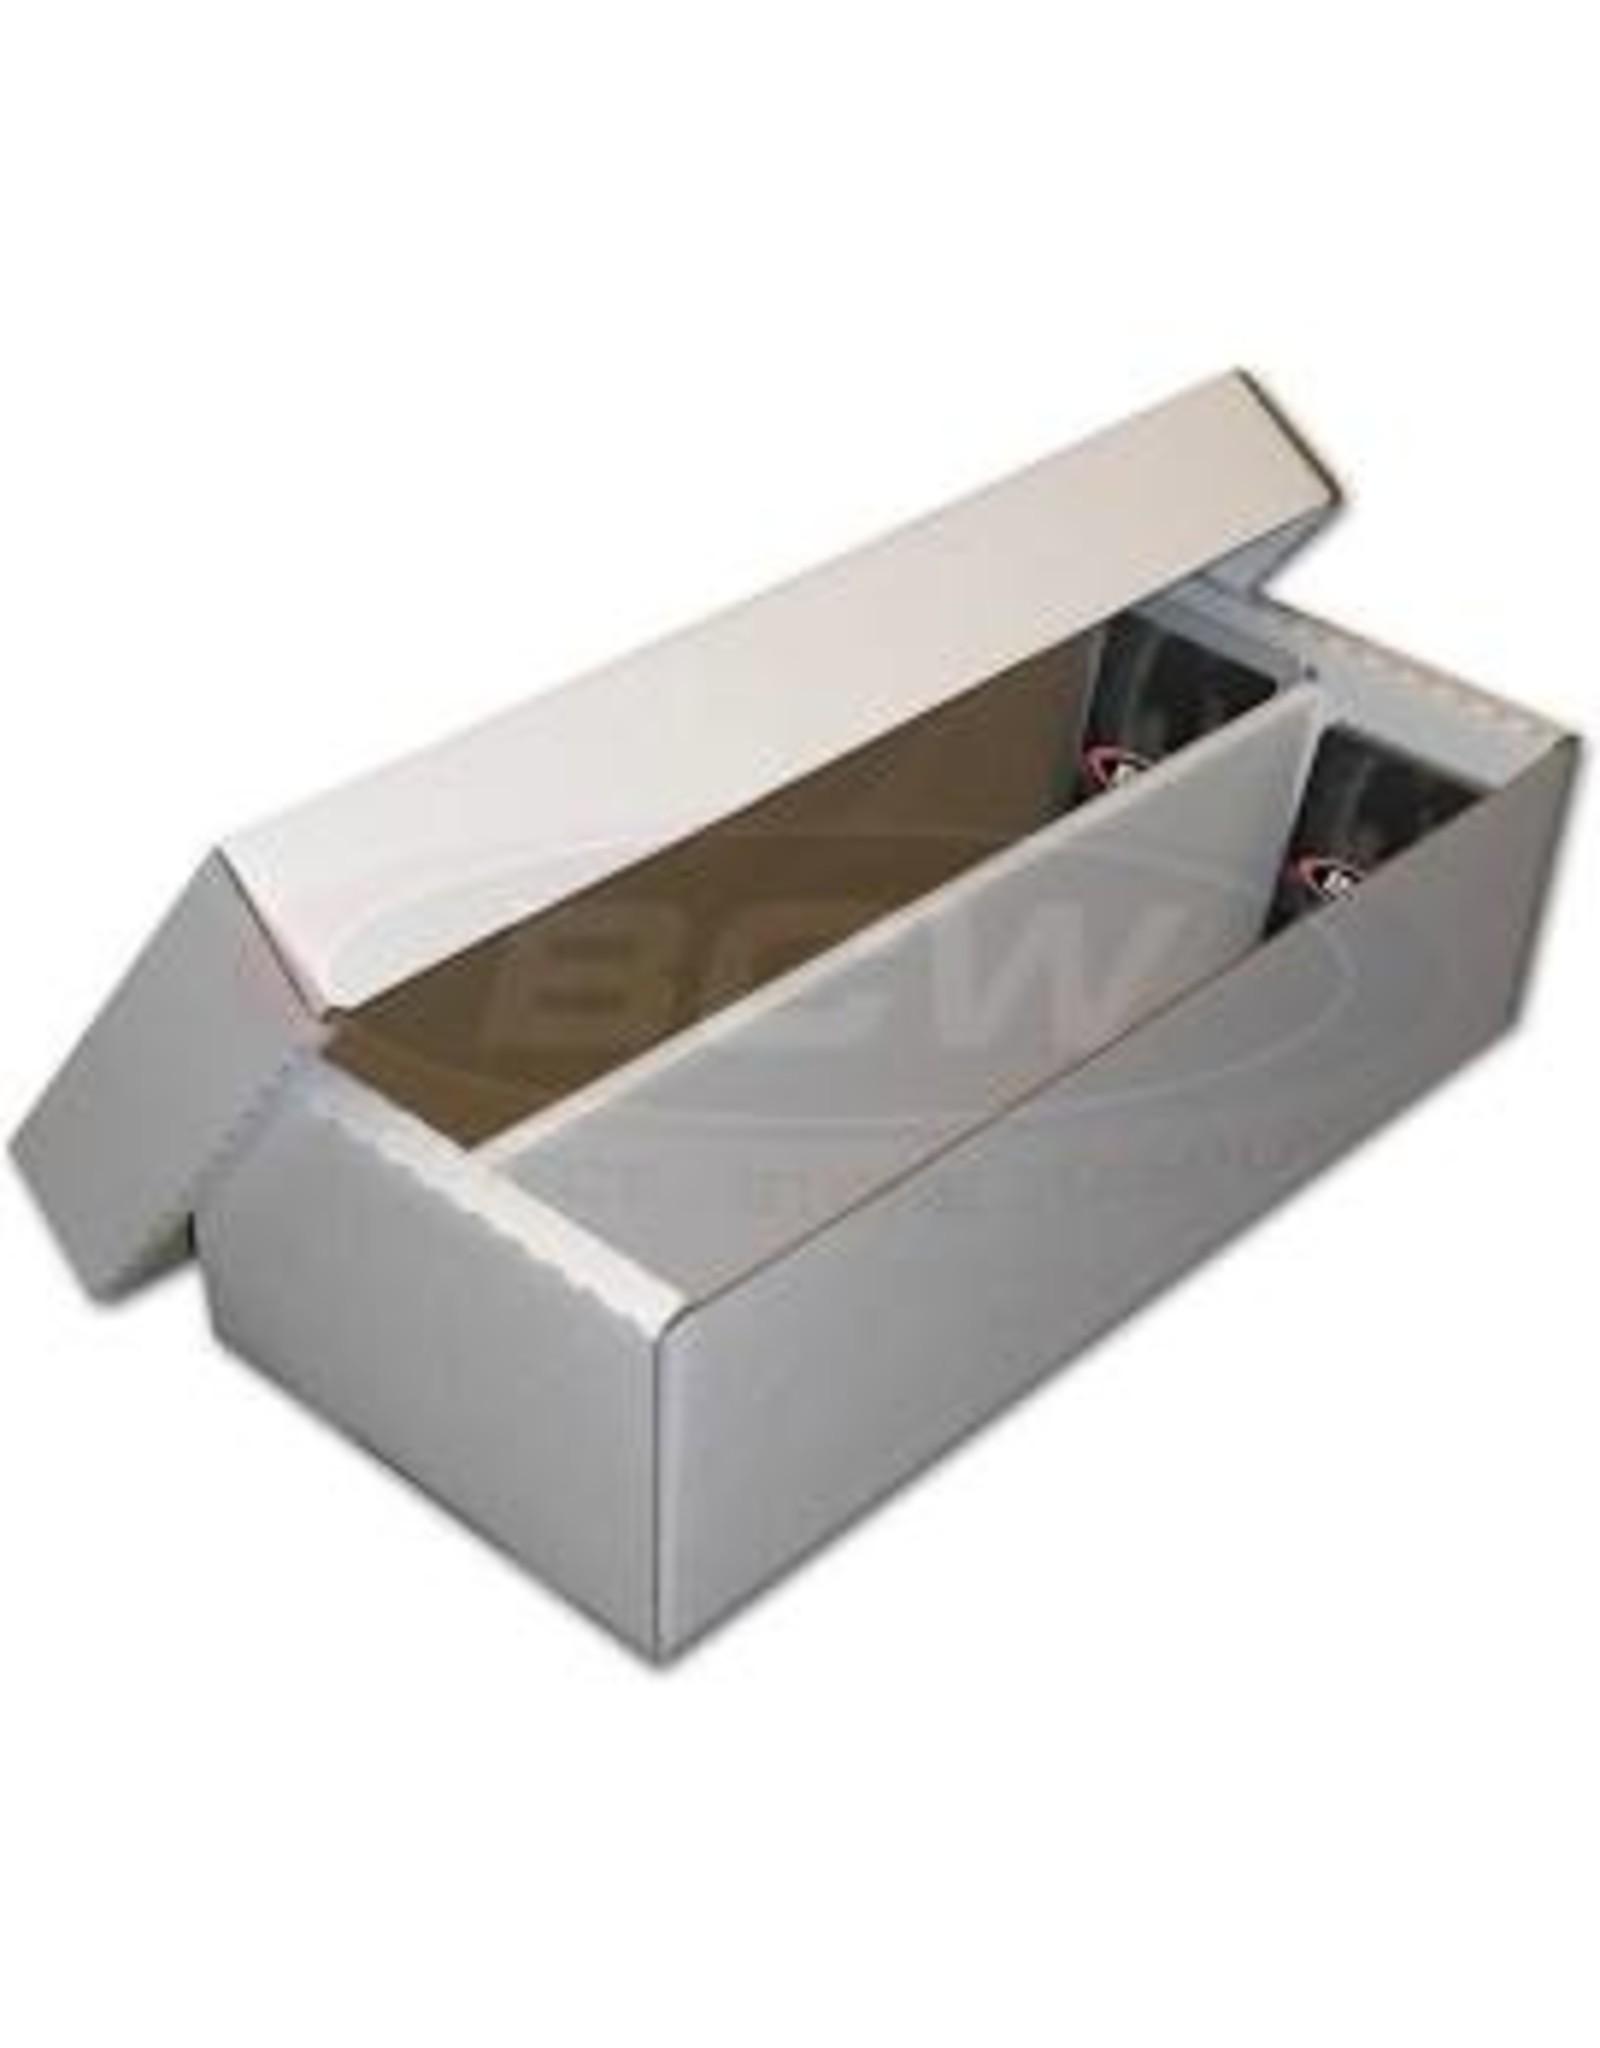 BCD Cardboard Box - 1600 Count